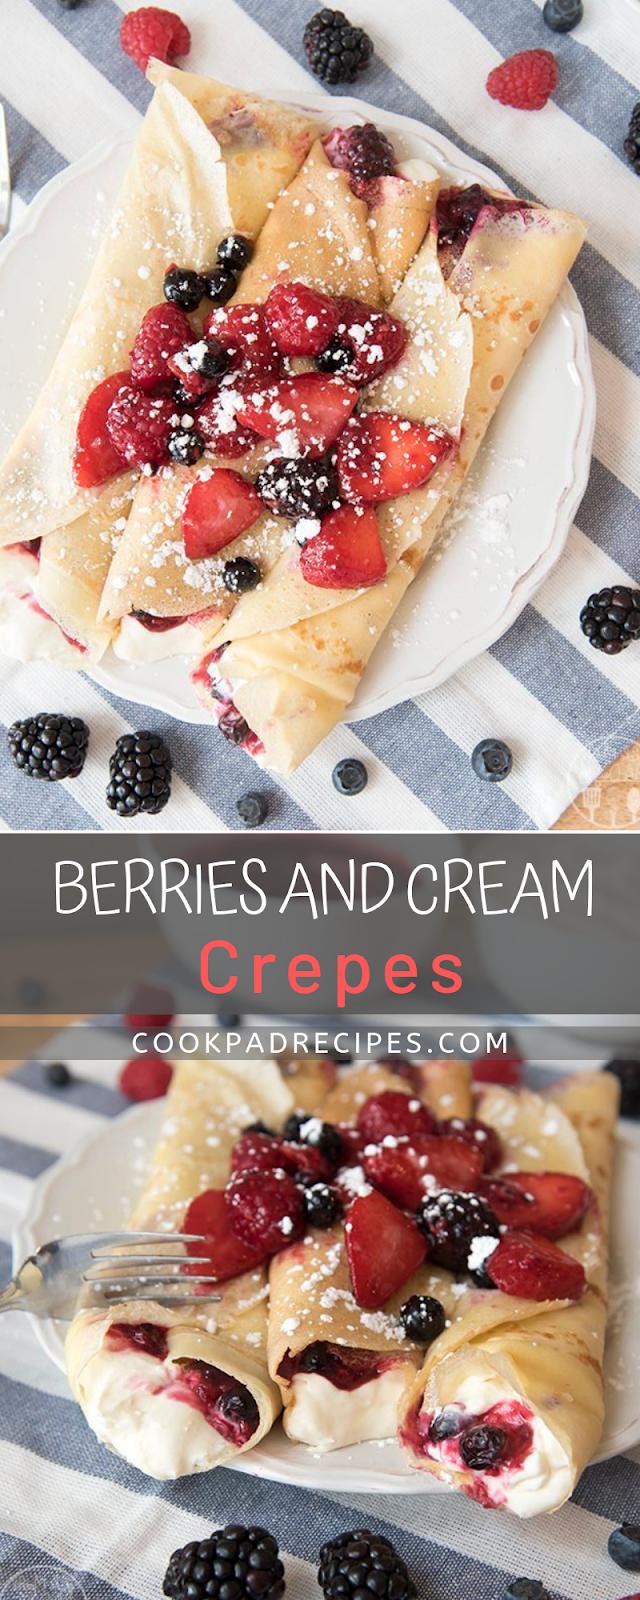 Bеrrіеѕ аnd Cream Crepes